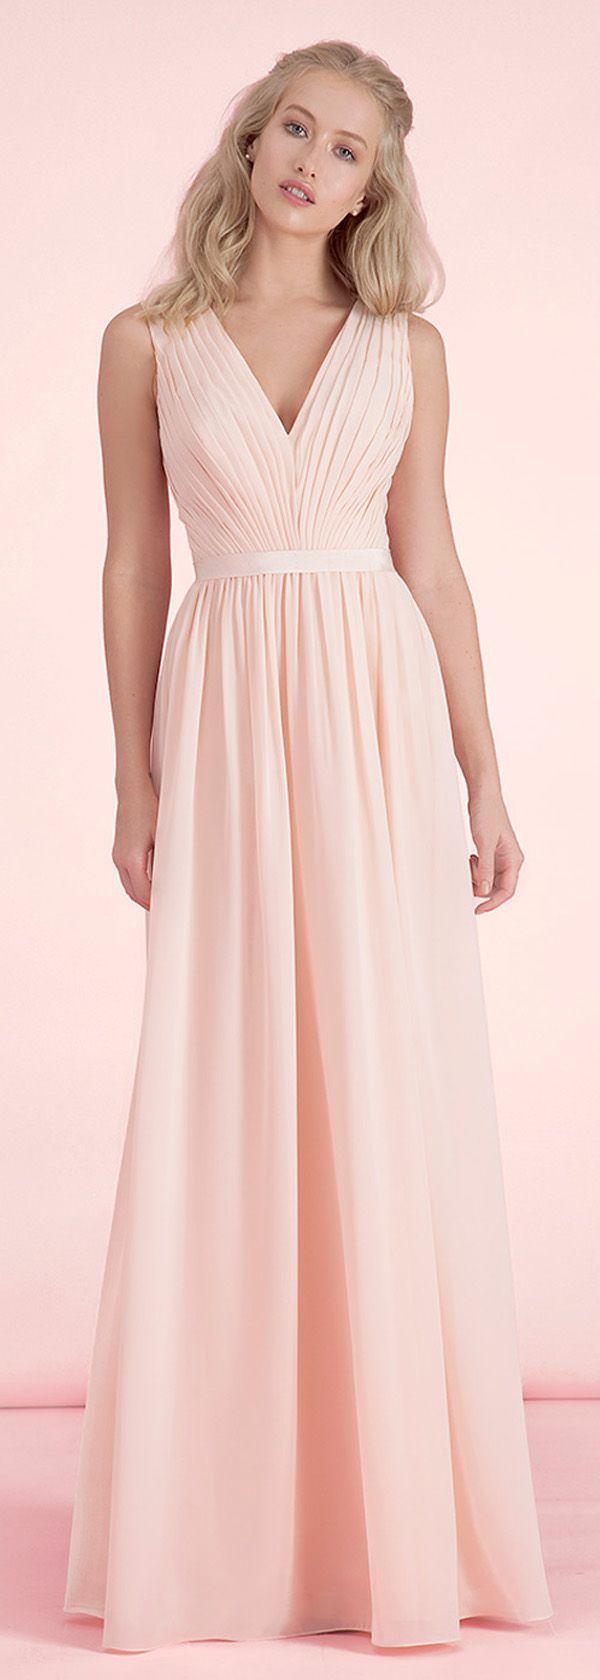 Exquisite chiffon vneck neckline aline bridesmaid dresses style